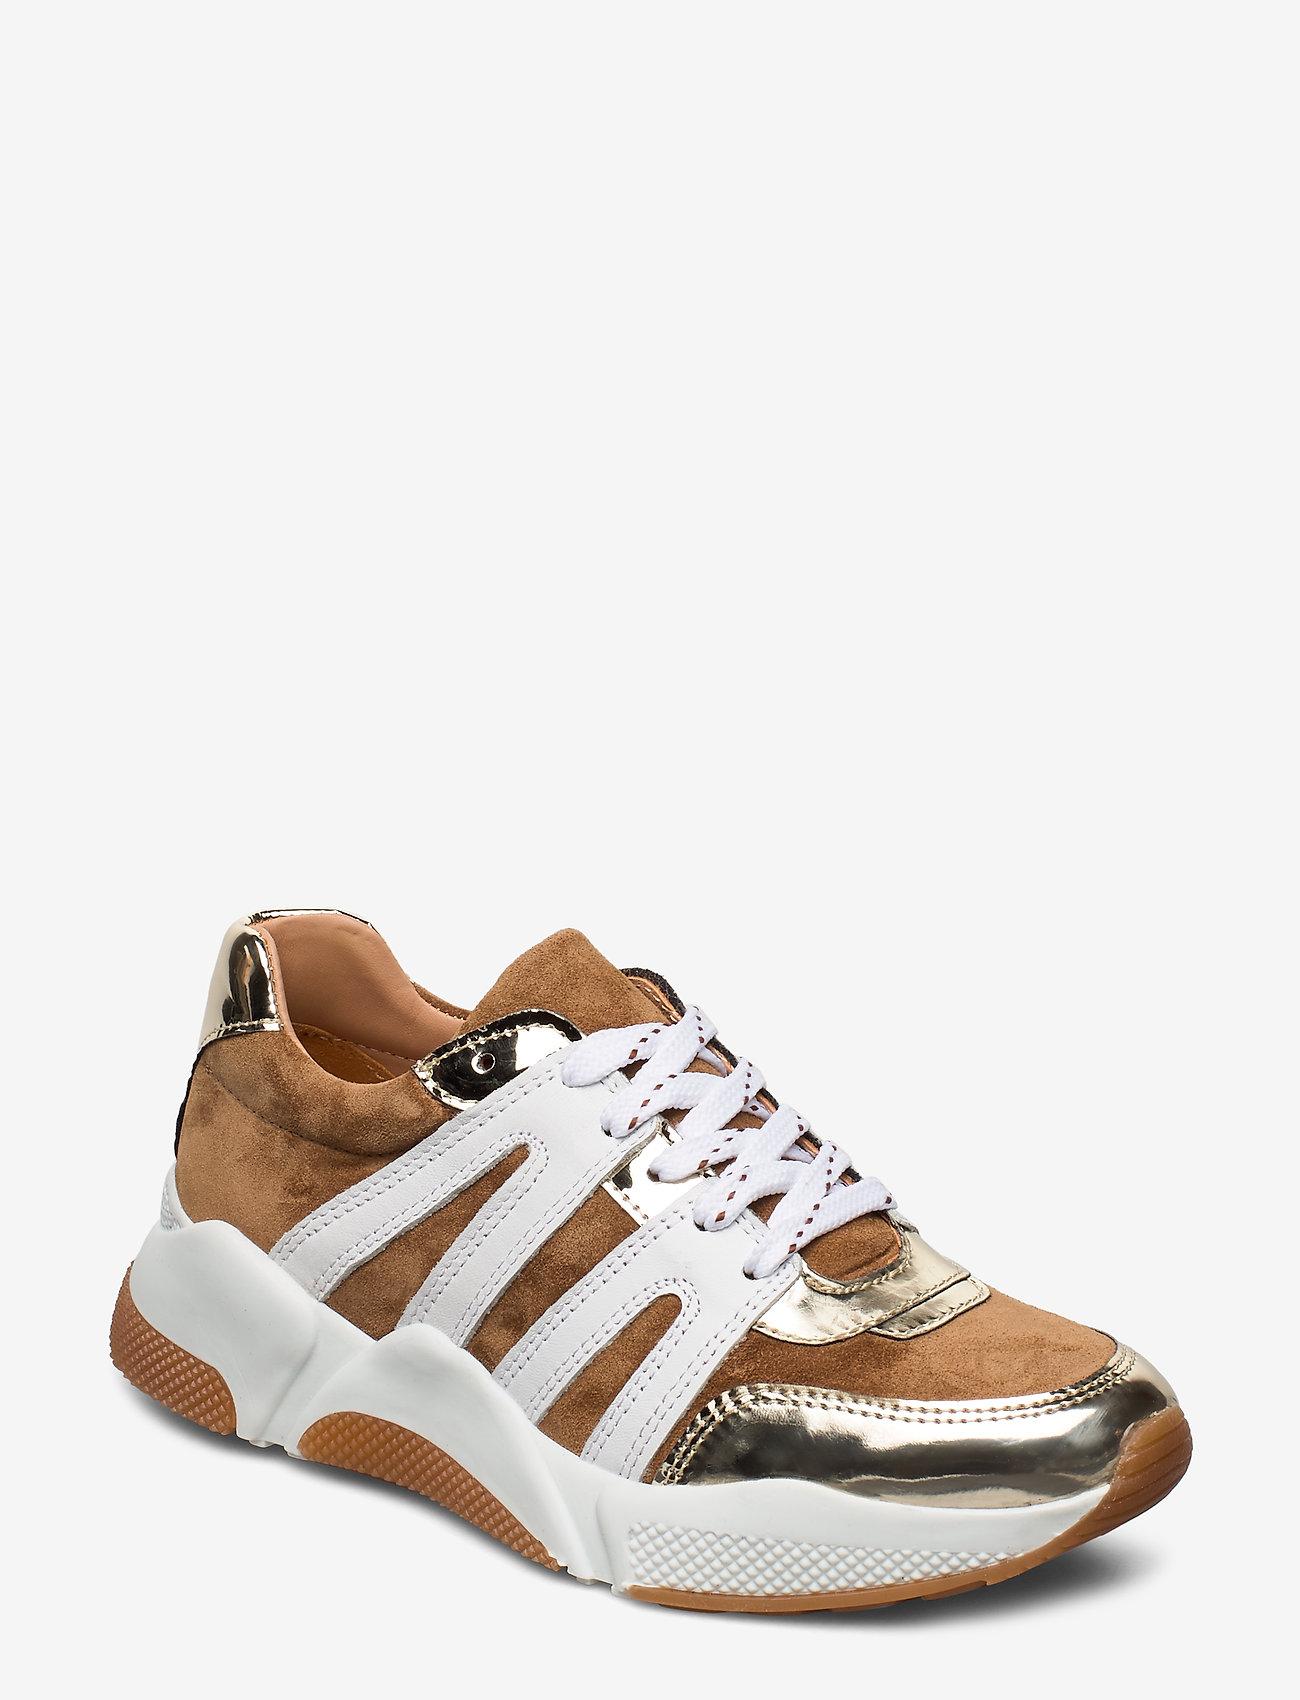 Billi Bi - Sport 4280 - sneakers med lav ankel - gold/beige/white comb.222 - 0